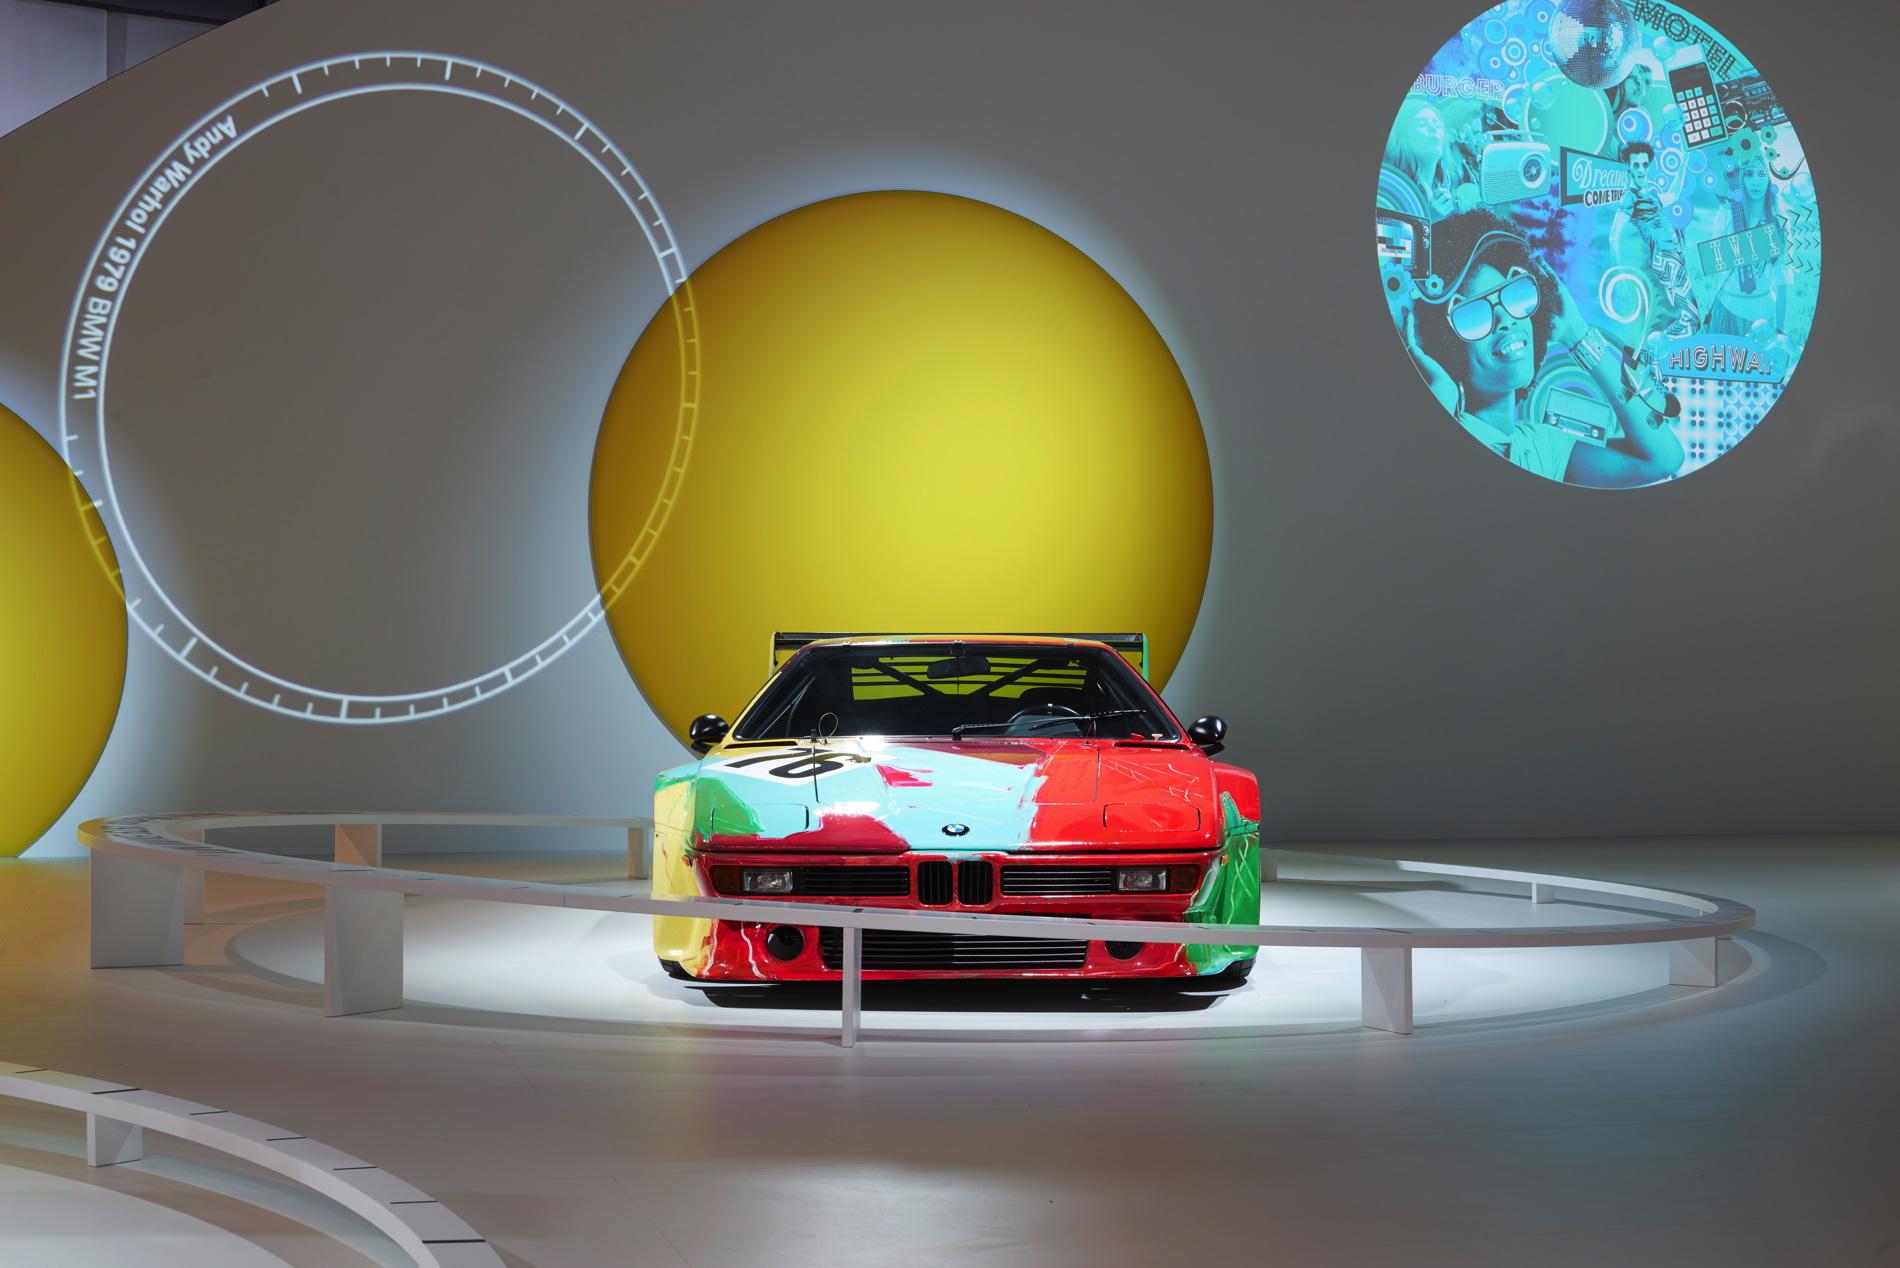 bmw art cars 1900x1200 24